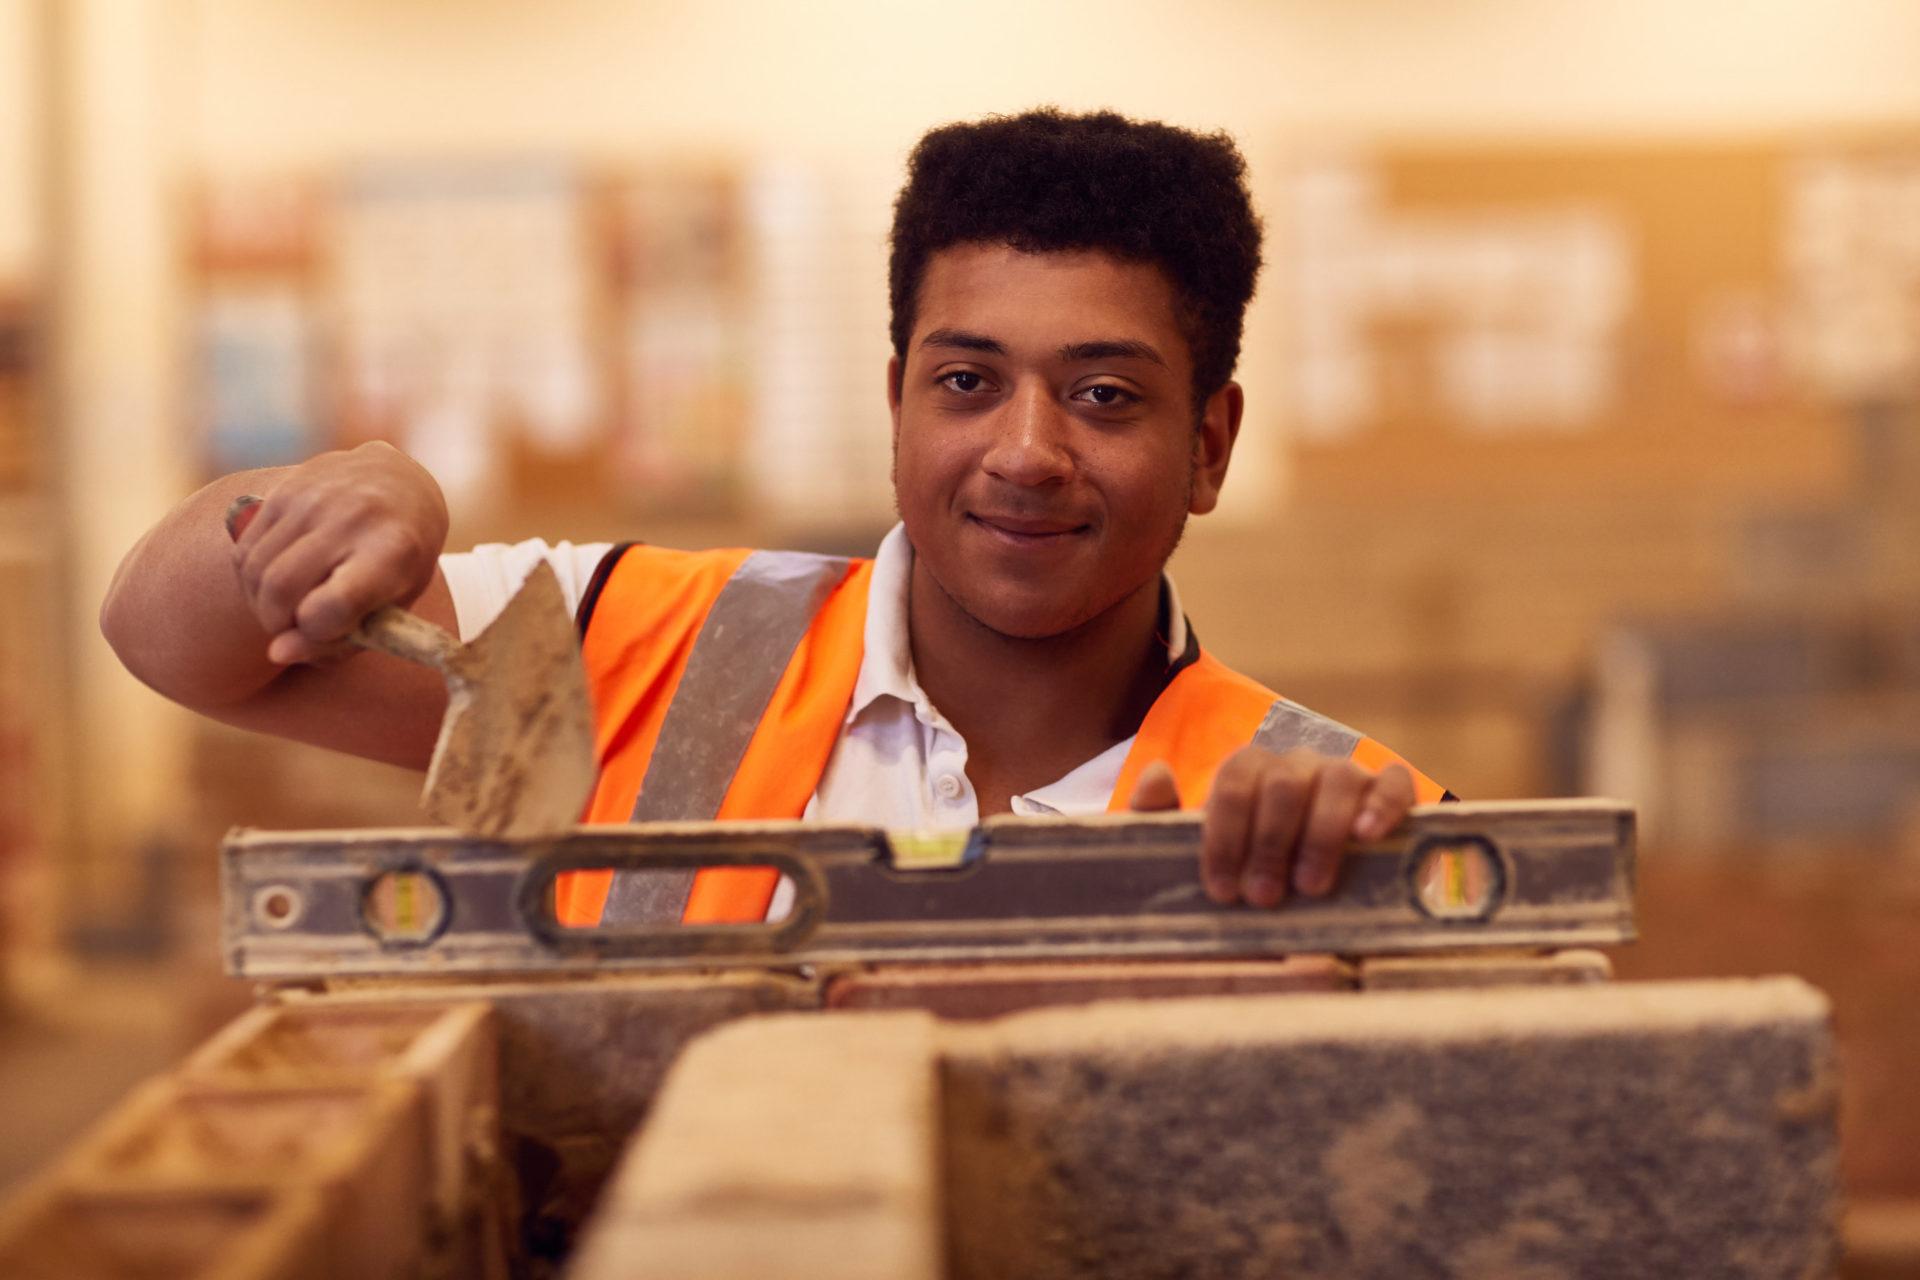 Construction course student